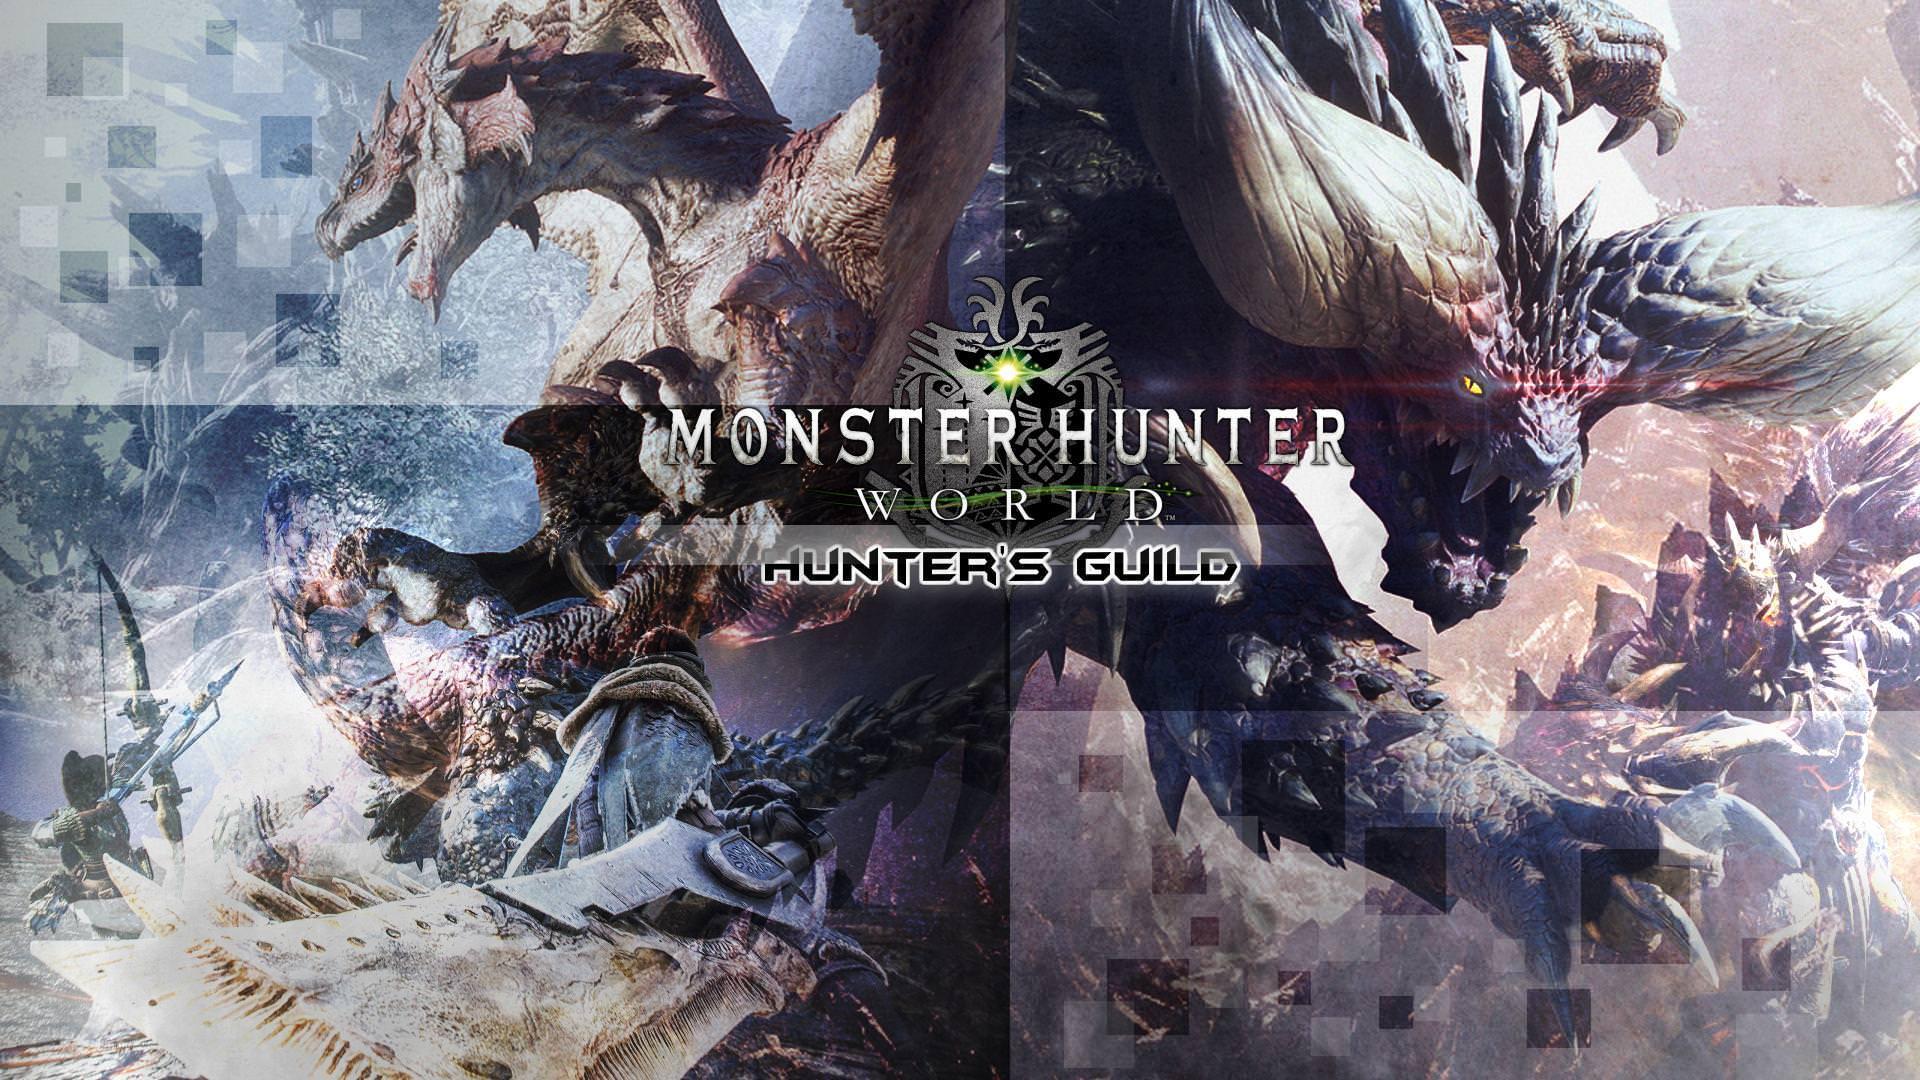 Download Monster Hunter World Wallpaper Hd Backgrounds Download